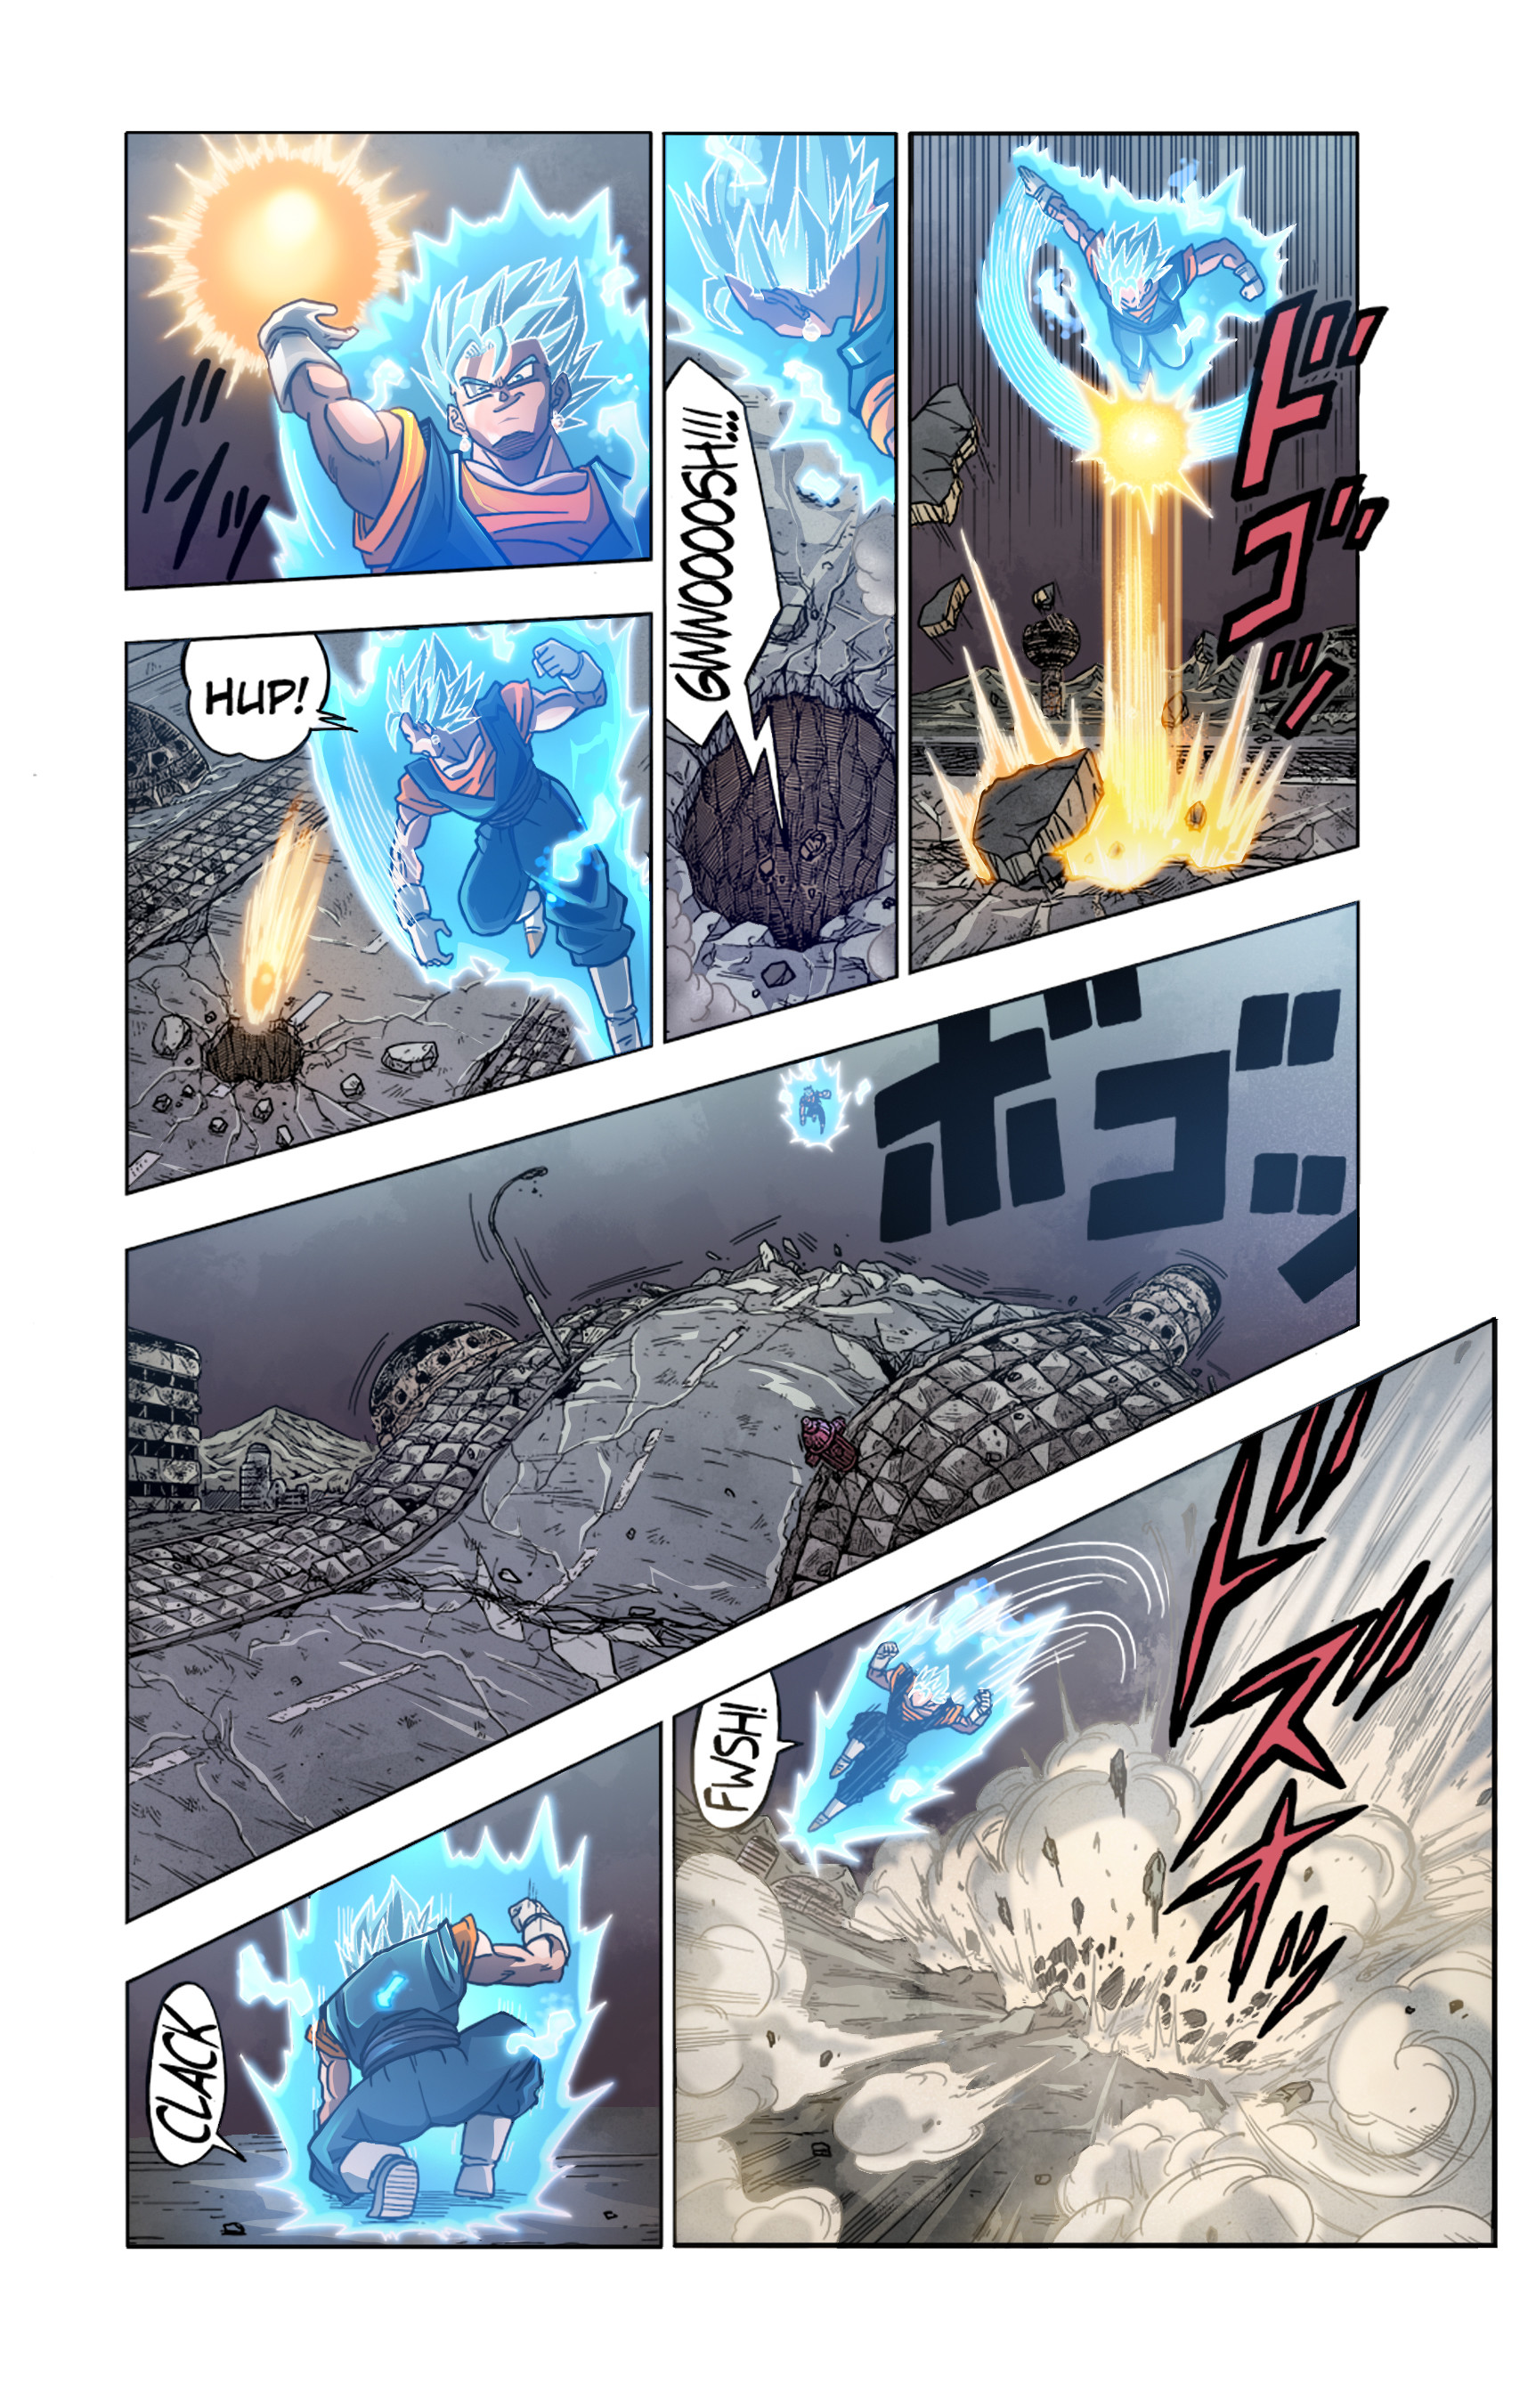 Jay F Dragon Ball Super Manga Color